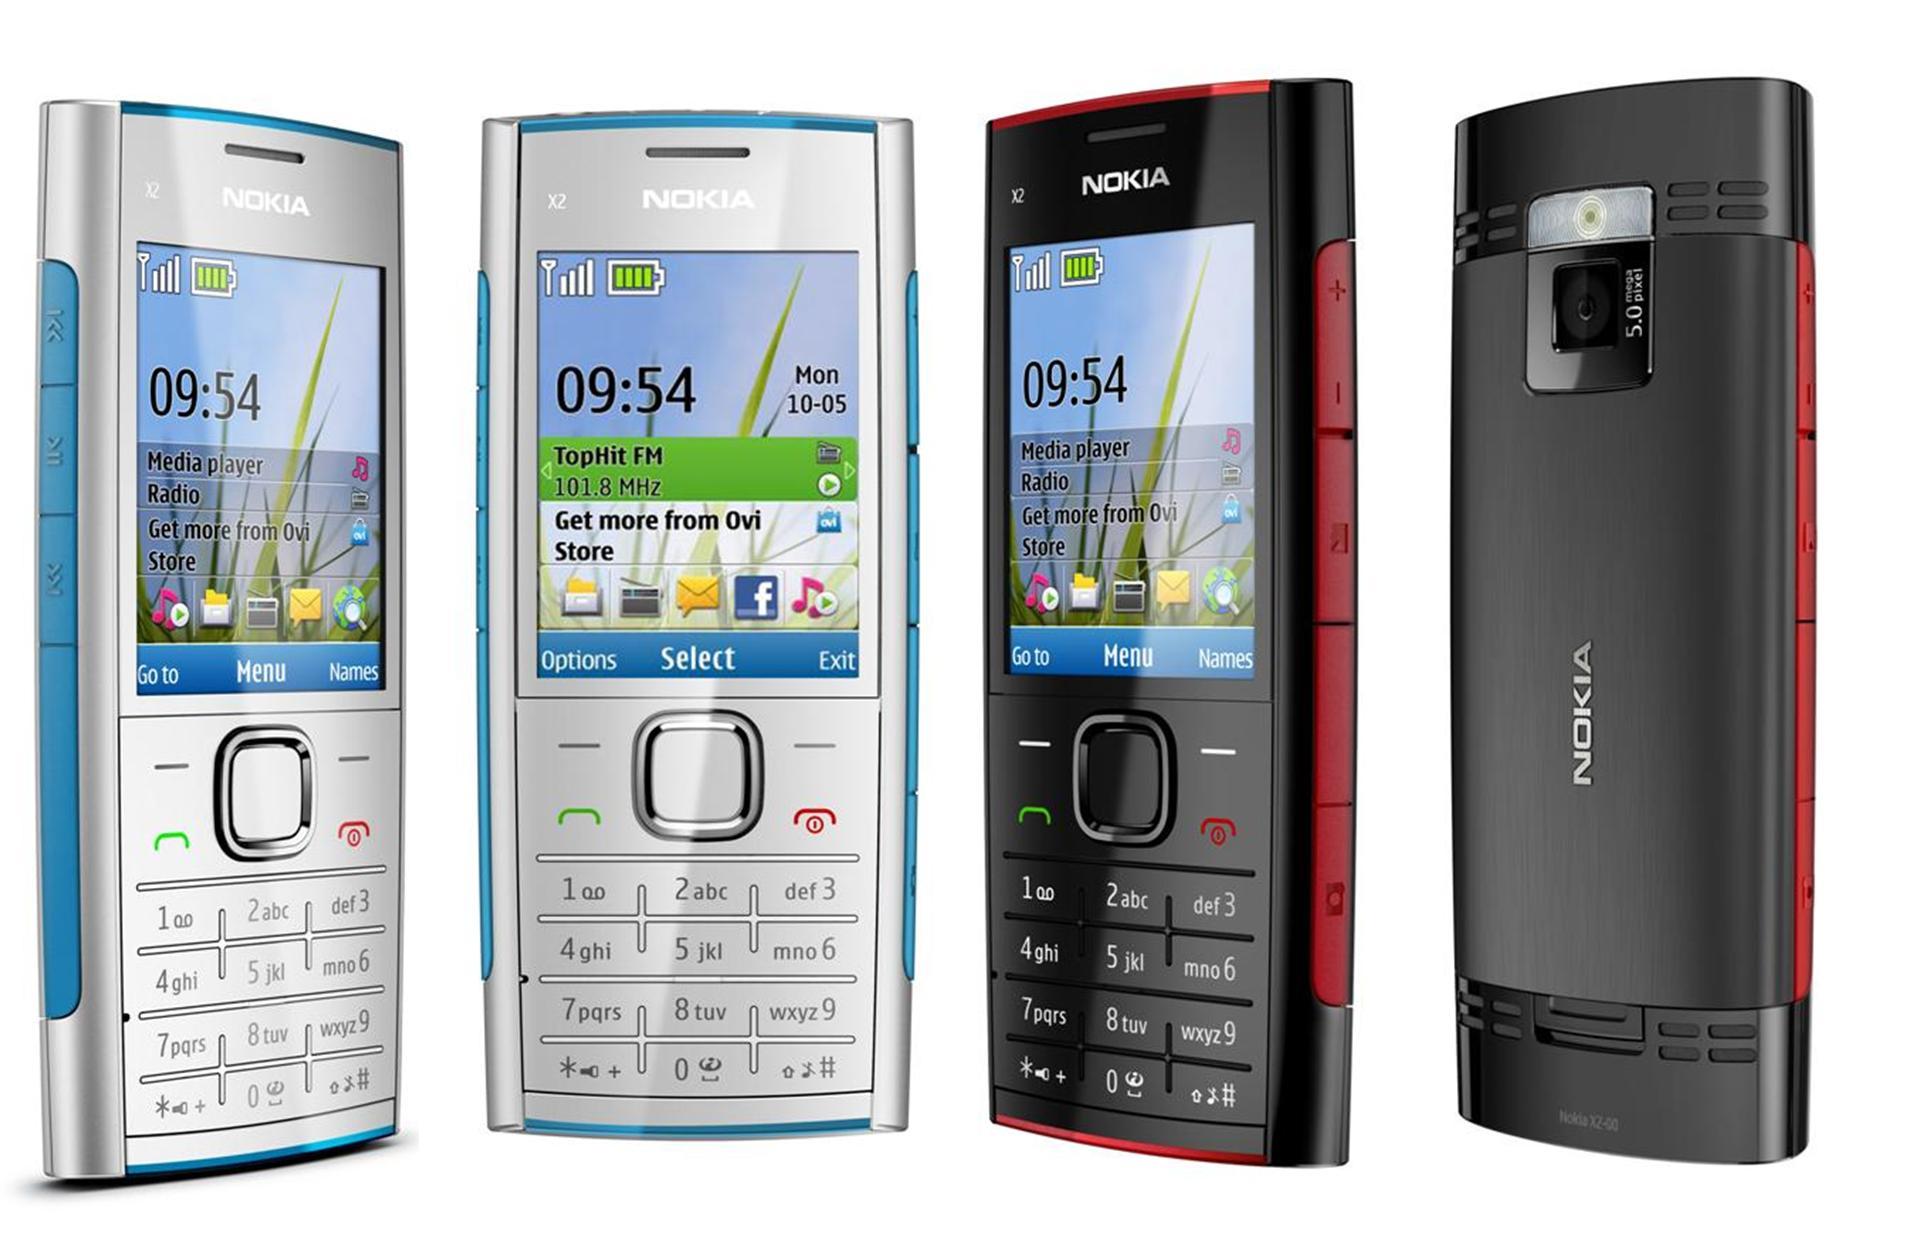 Come scaricare WhatsApp Free per Nokia X2-01, Nokia X2 e X3-02 Touch and Type? 1